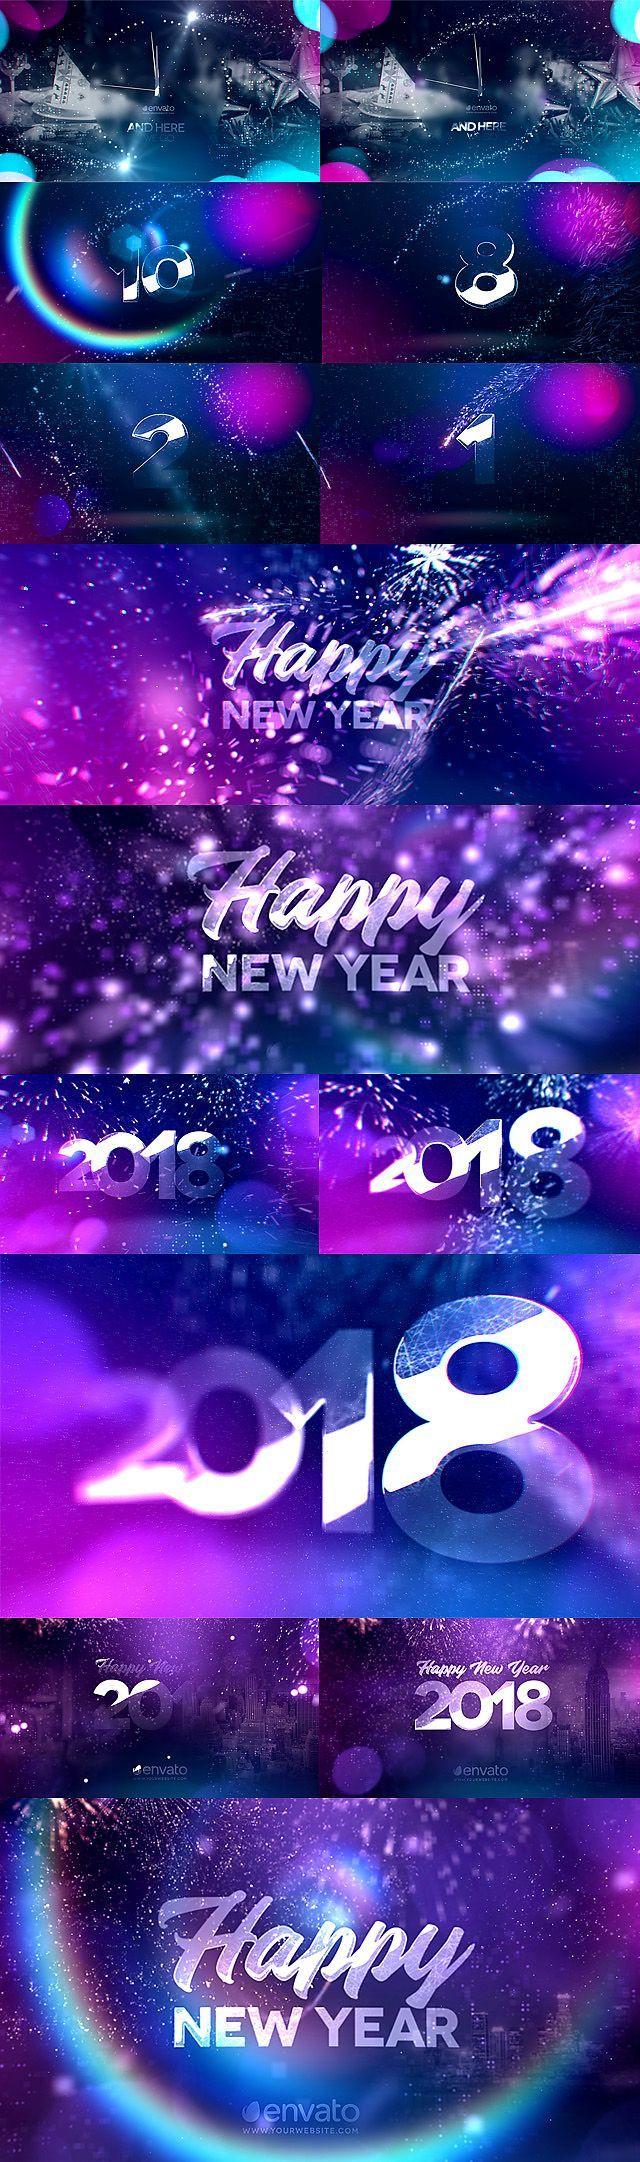 New Year Countdown 2020 New years countdown, Countdown